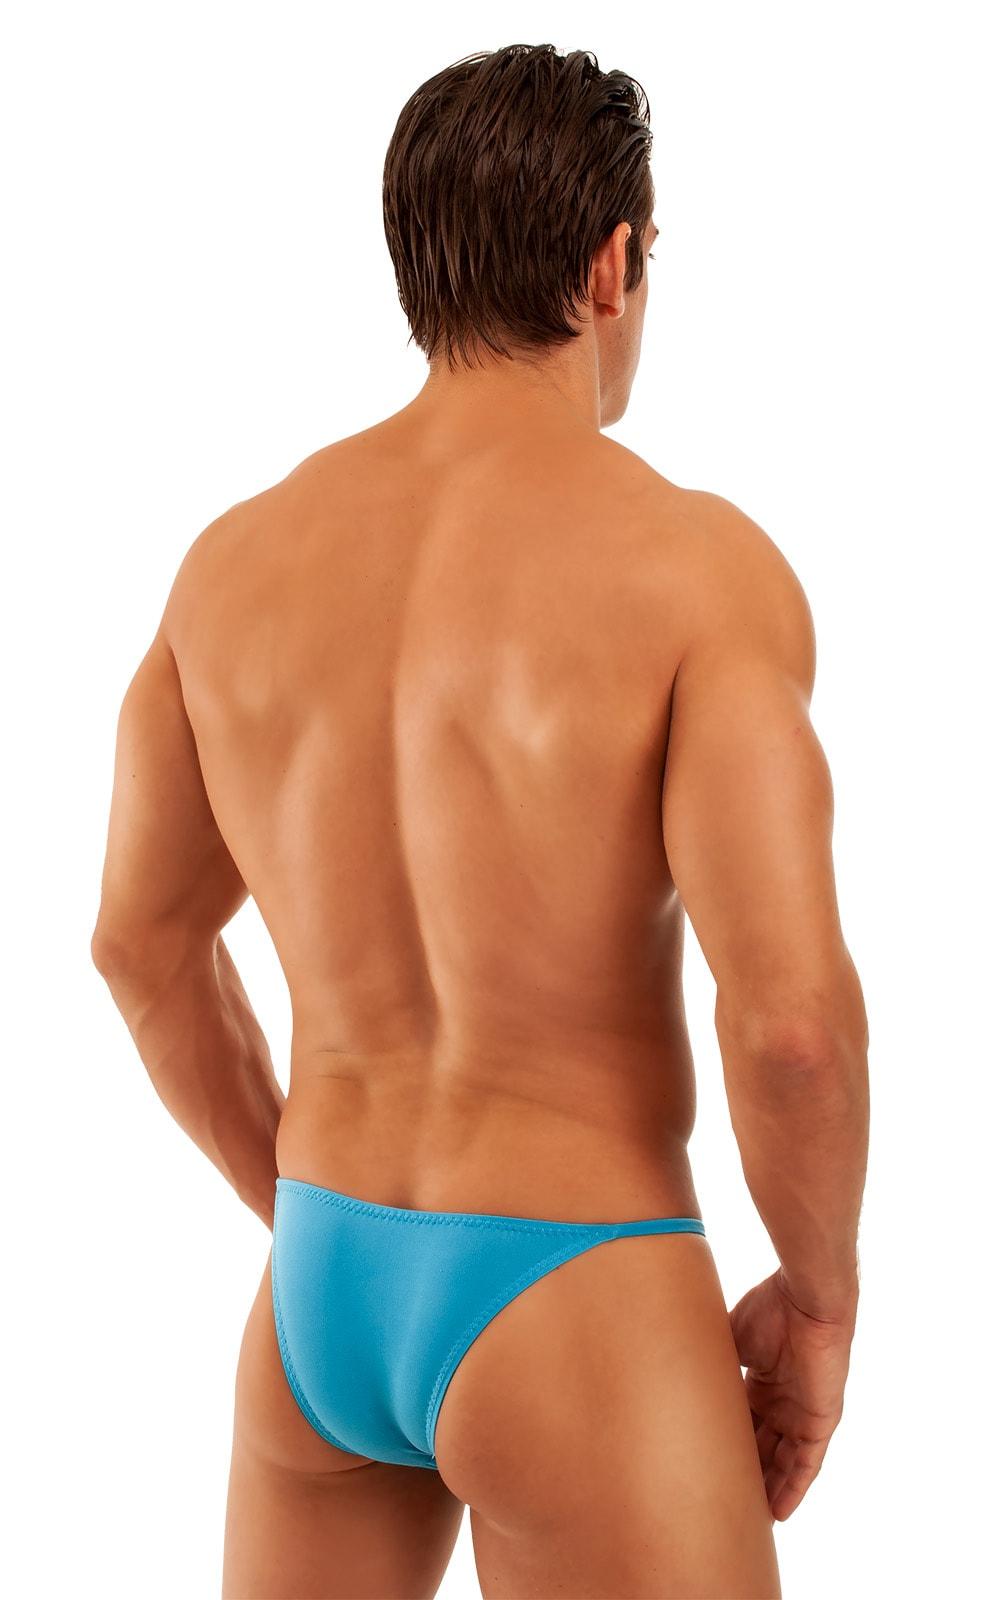 Super Low Brazilian Bikini in Semi Sheer ThinSKINZ Turquoise 3